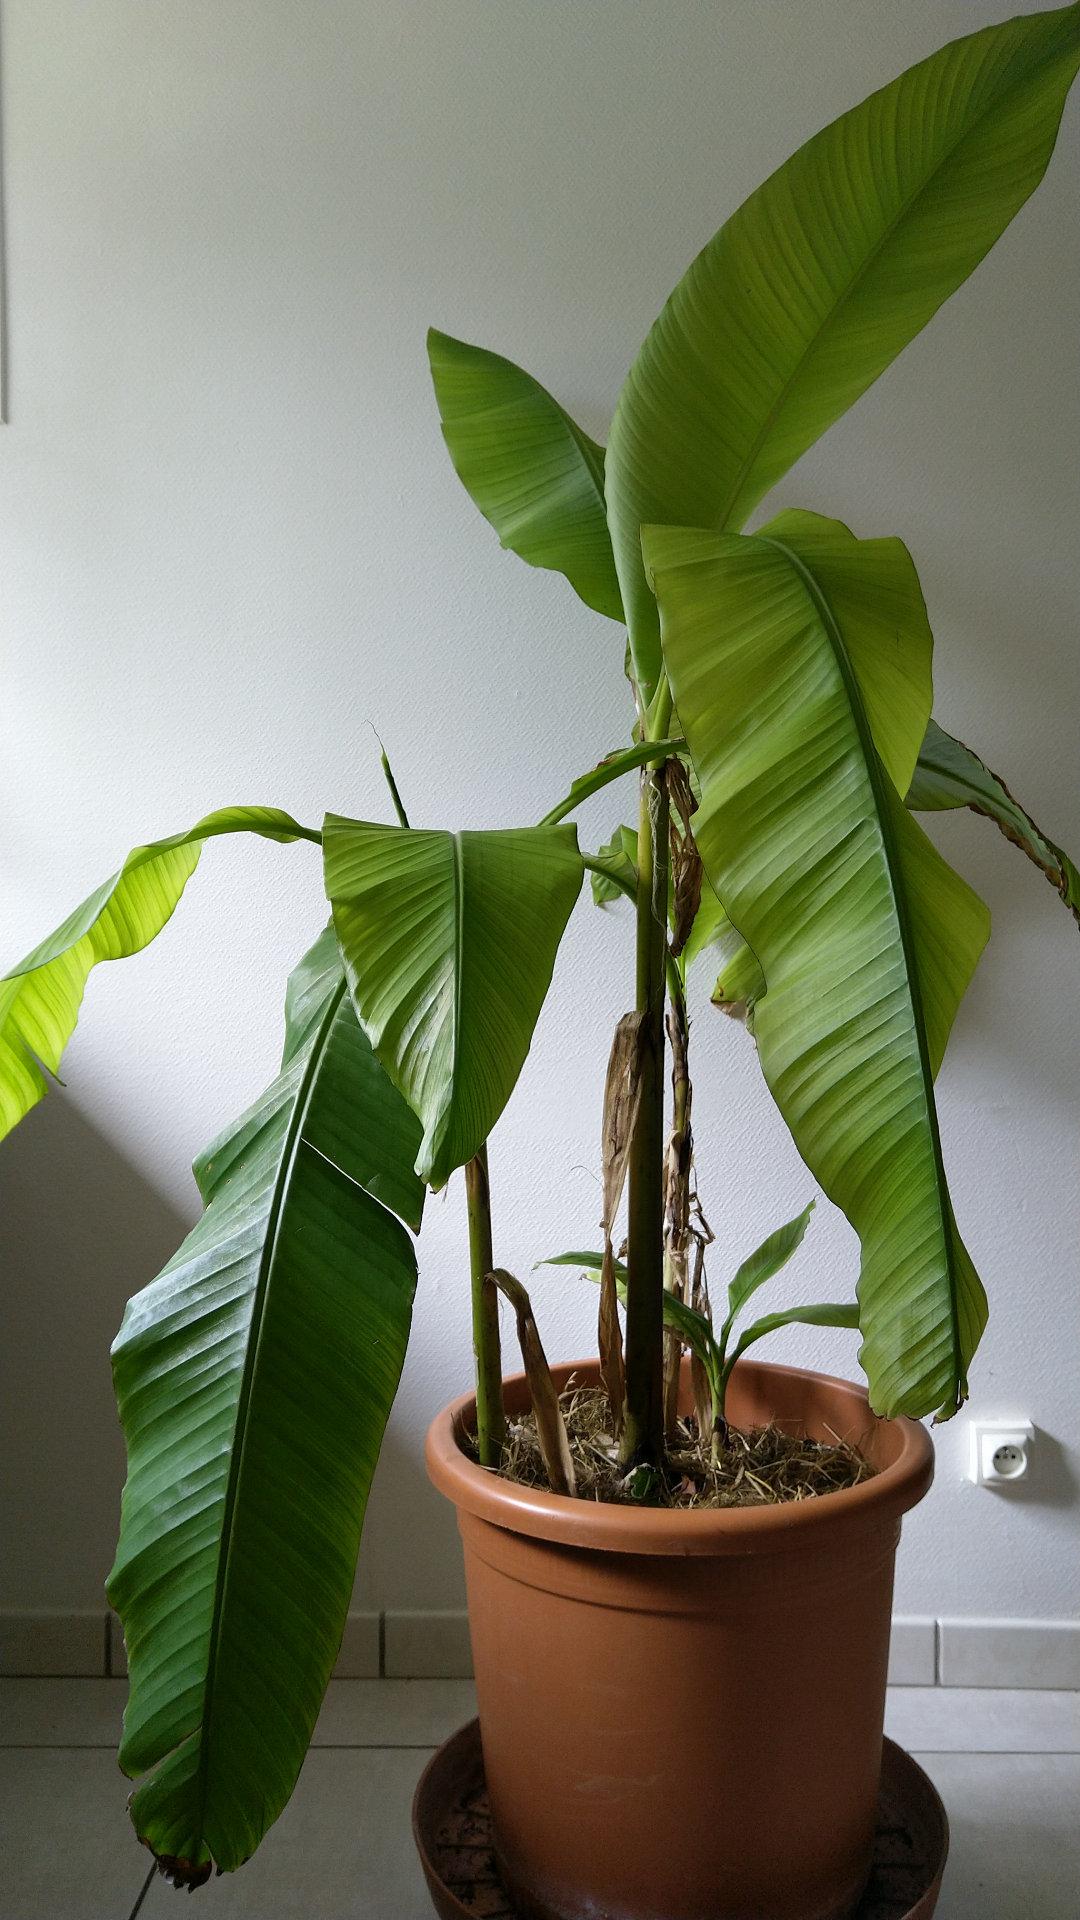 bananier-pot-fleur-bac-jardiniere-balcon